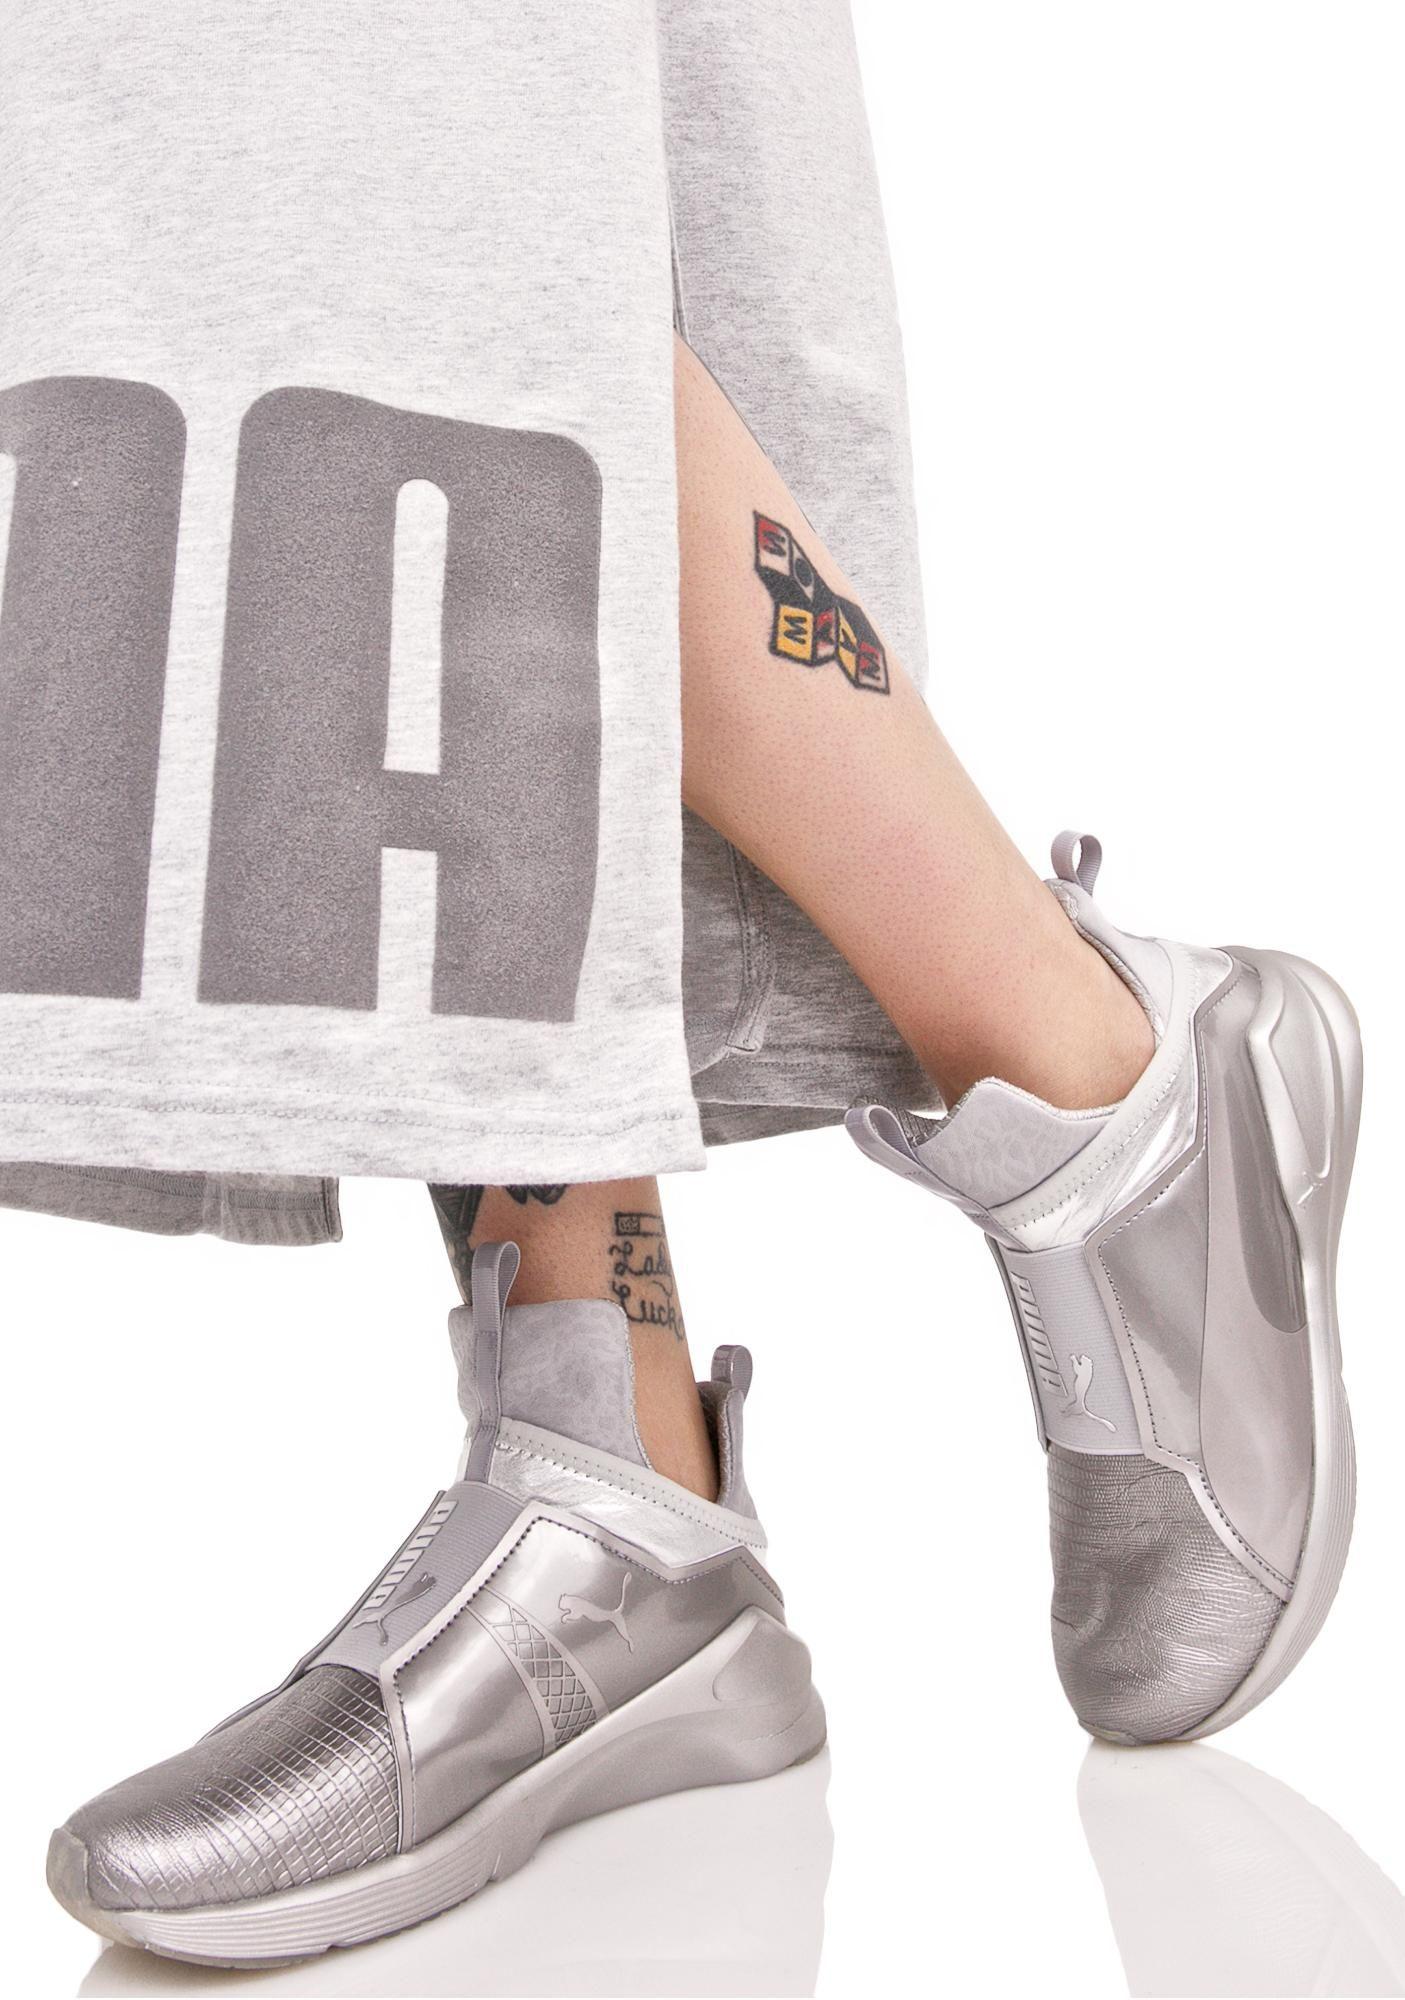 9ac27815eba7 PUMA Fierce Metallic Sneakers are gunna slay the streets